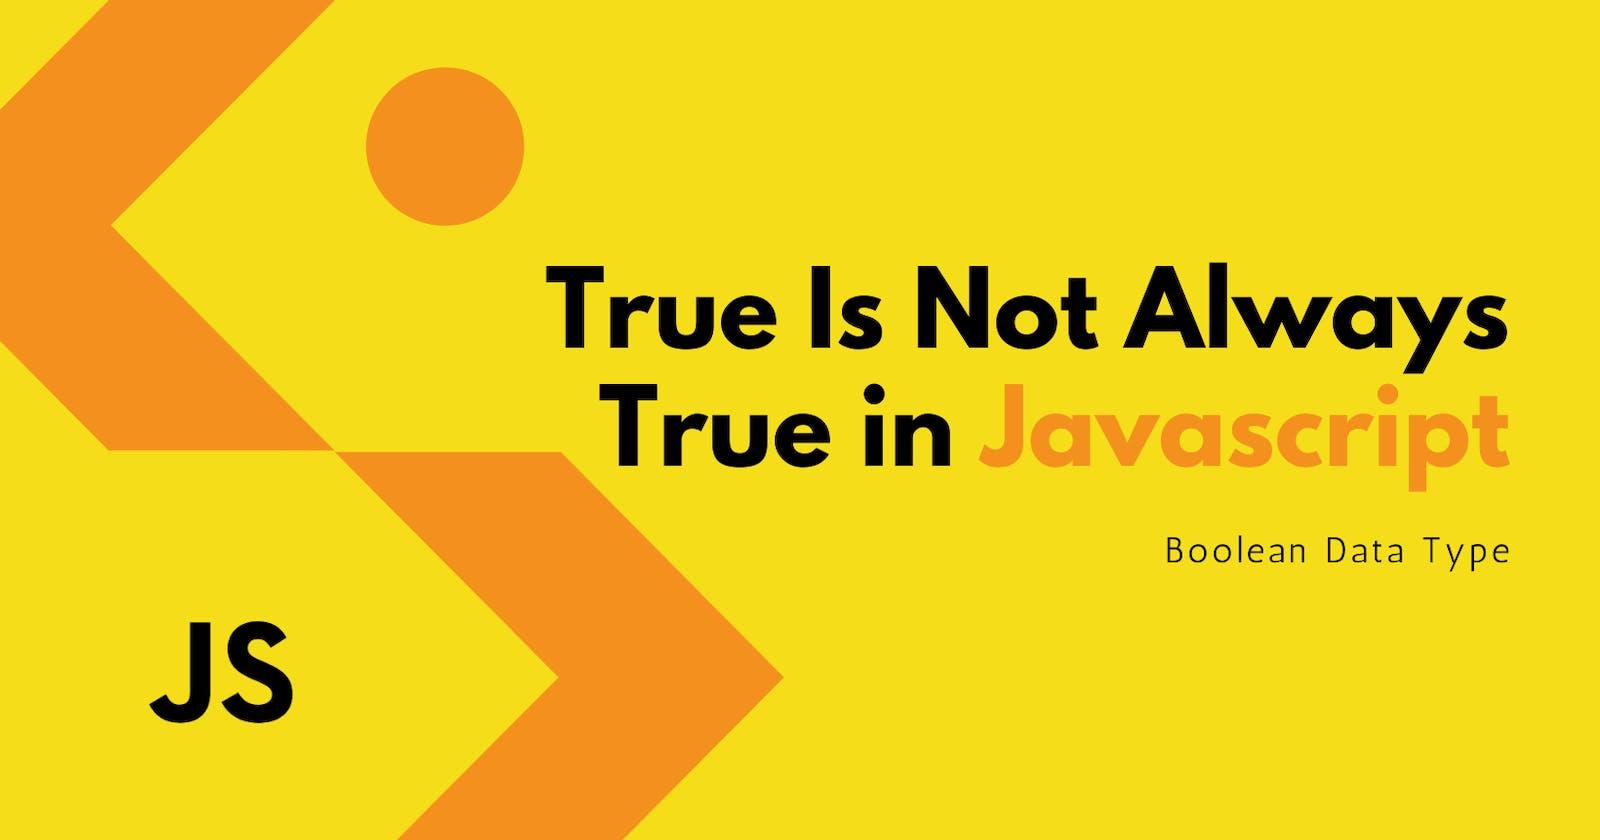 True Is Not Always True In JavaScript